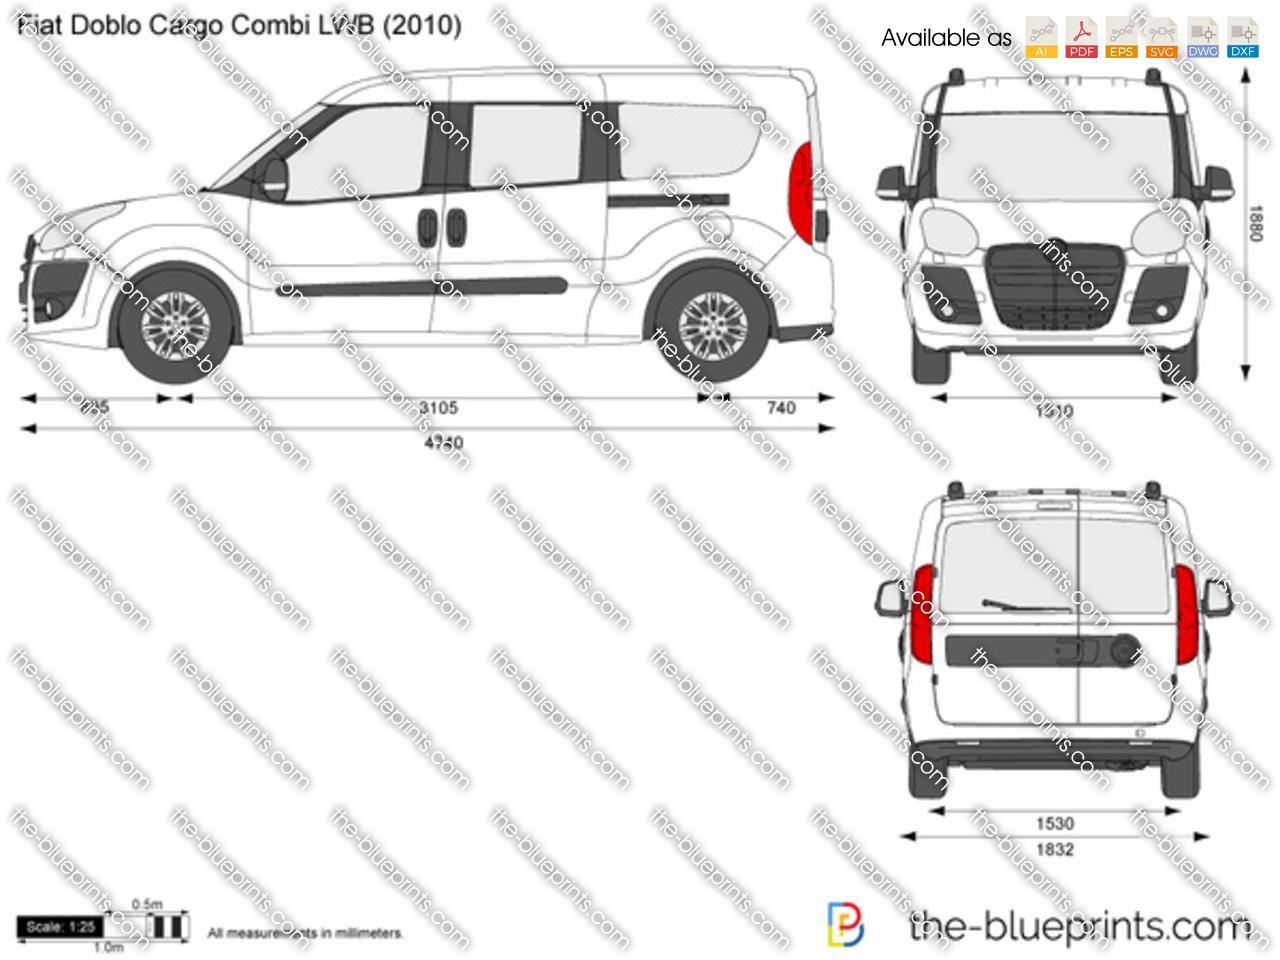 Fiat Doblo Cargo Combi LWB 2014